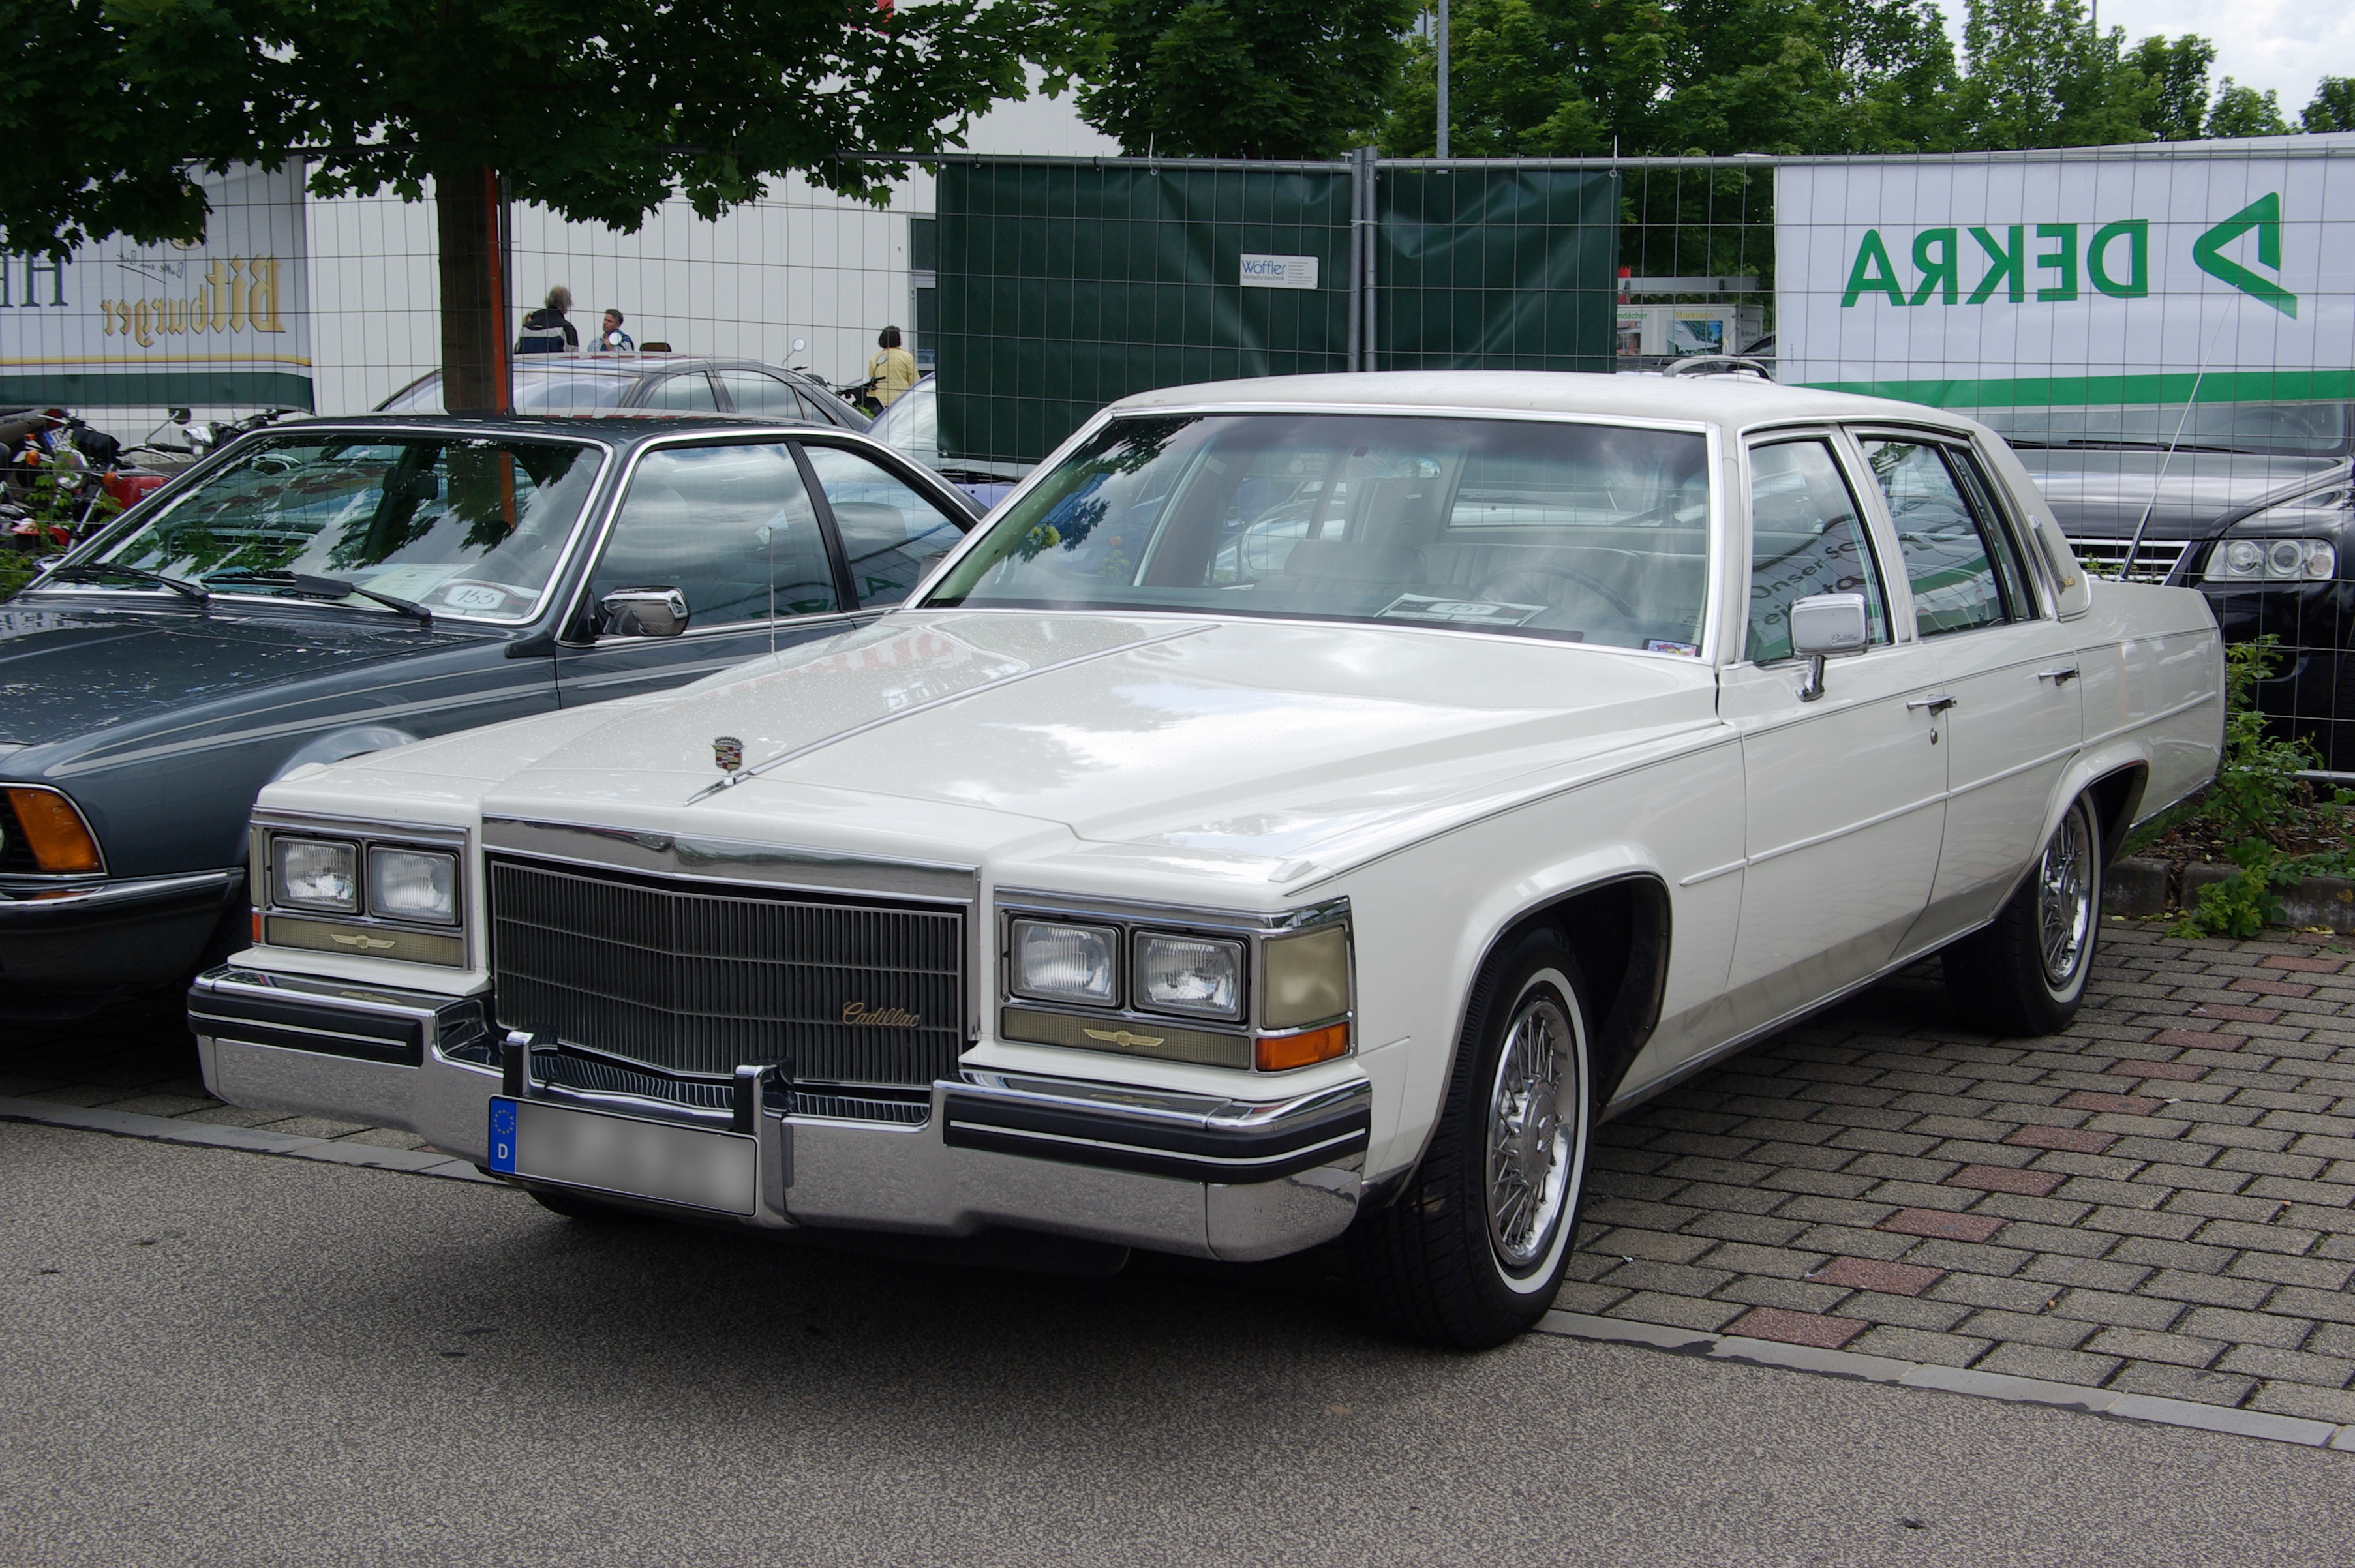 File Cadillac Sedan De Ville 2012 07 15 15 12 36 Jpg